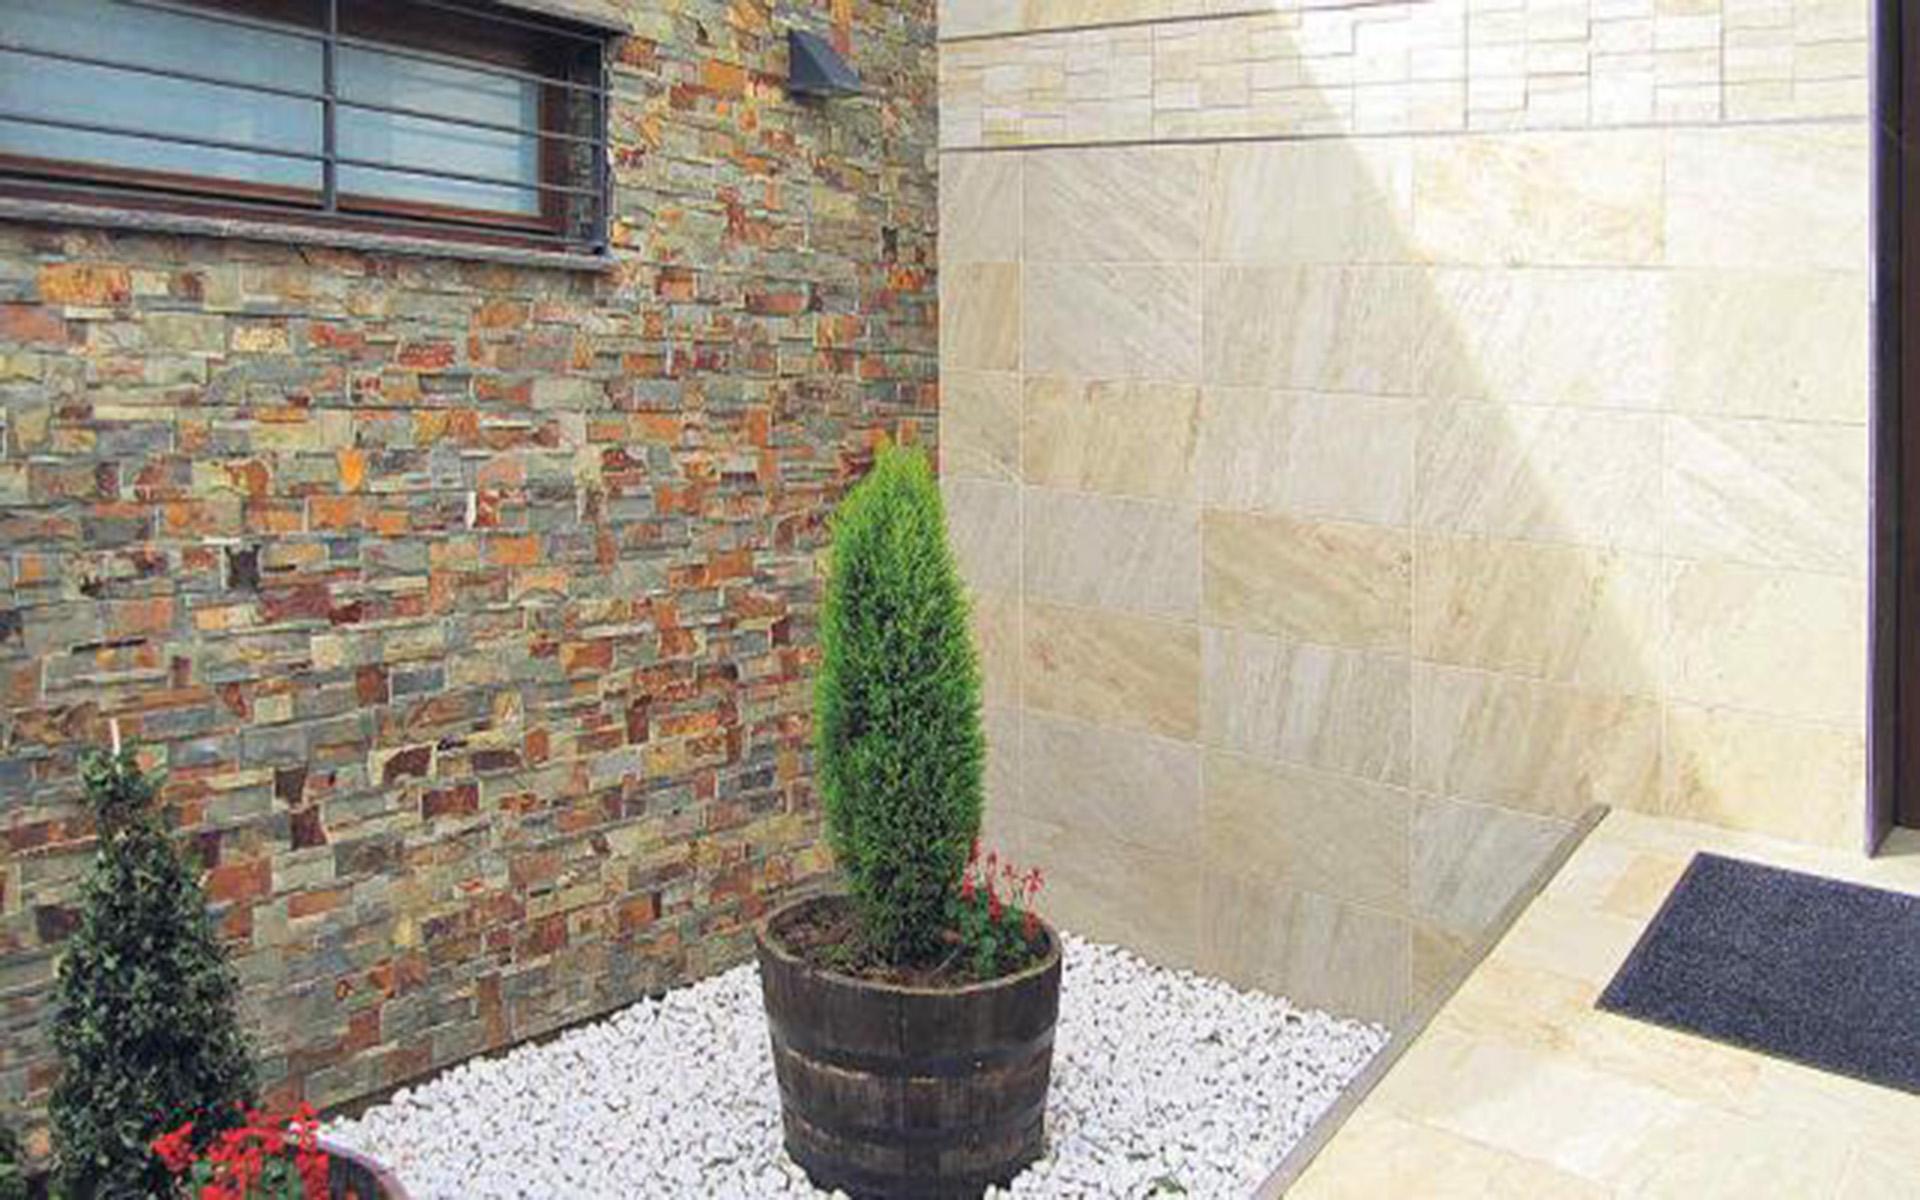 Piedras decoinnovar - Tipos de piedras para fachadas ...